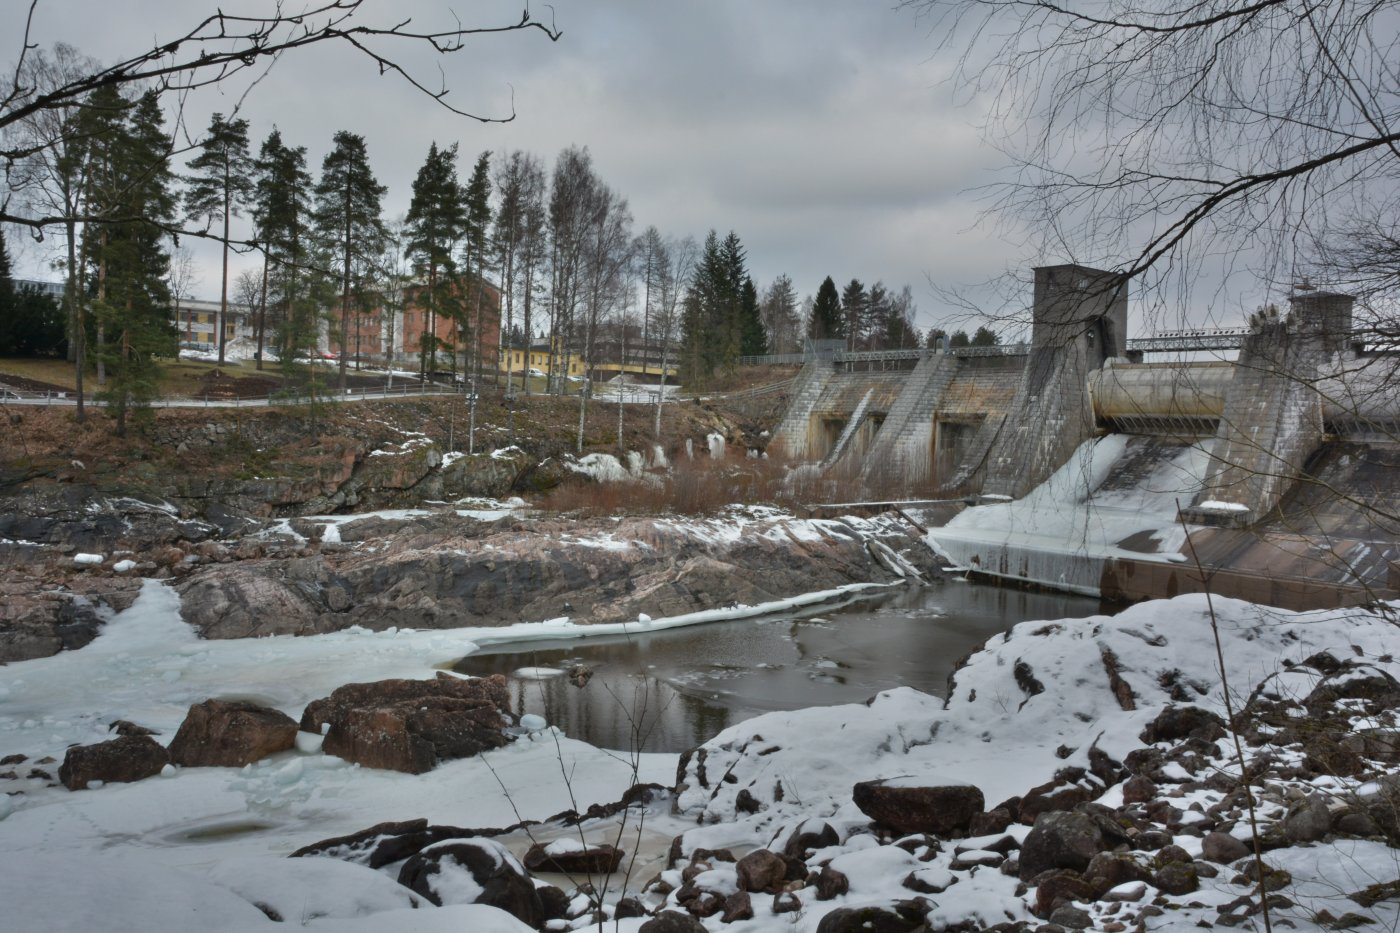 Фото Водопад. Финляндия, Imatrankoskentie,